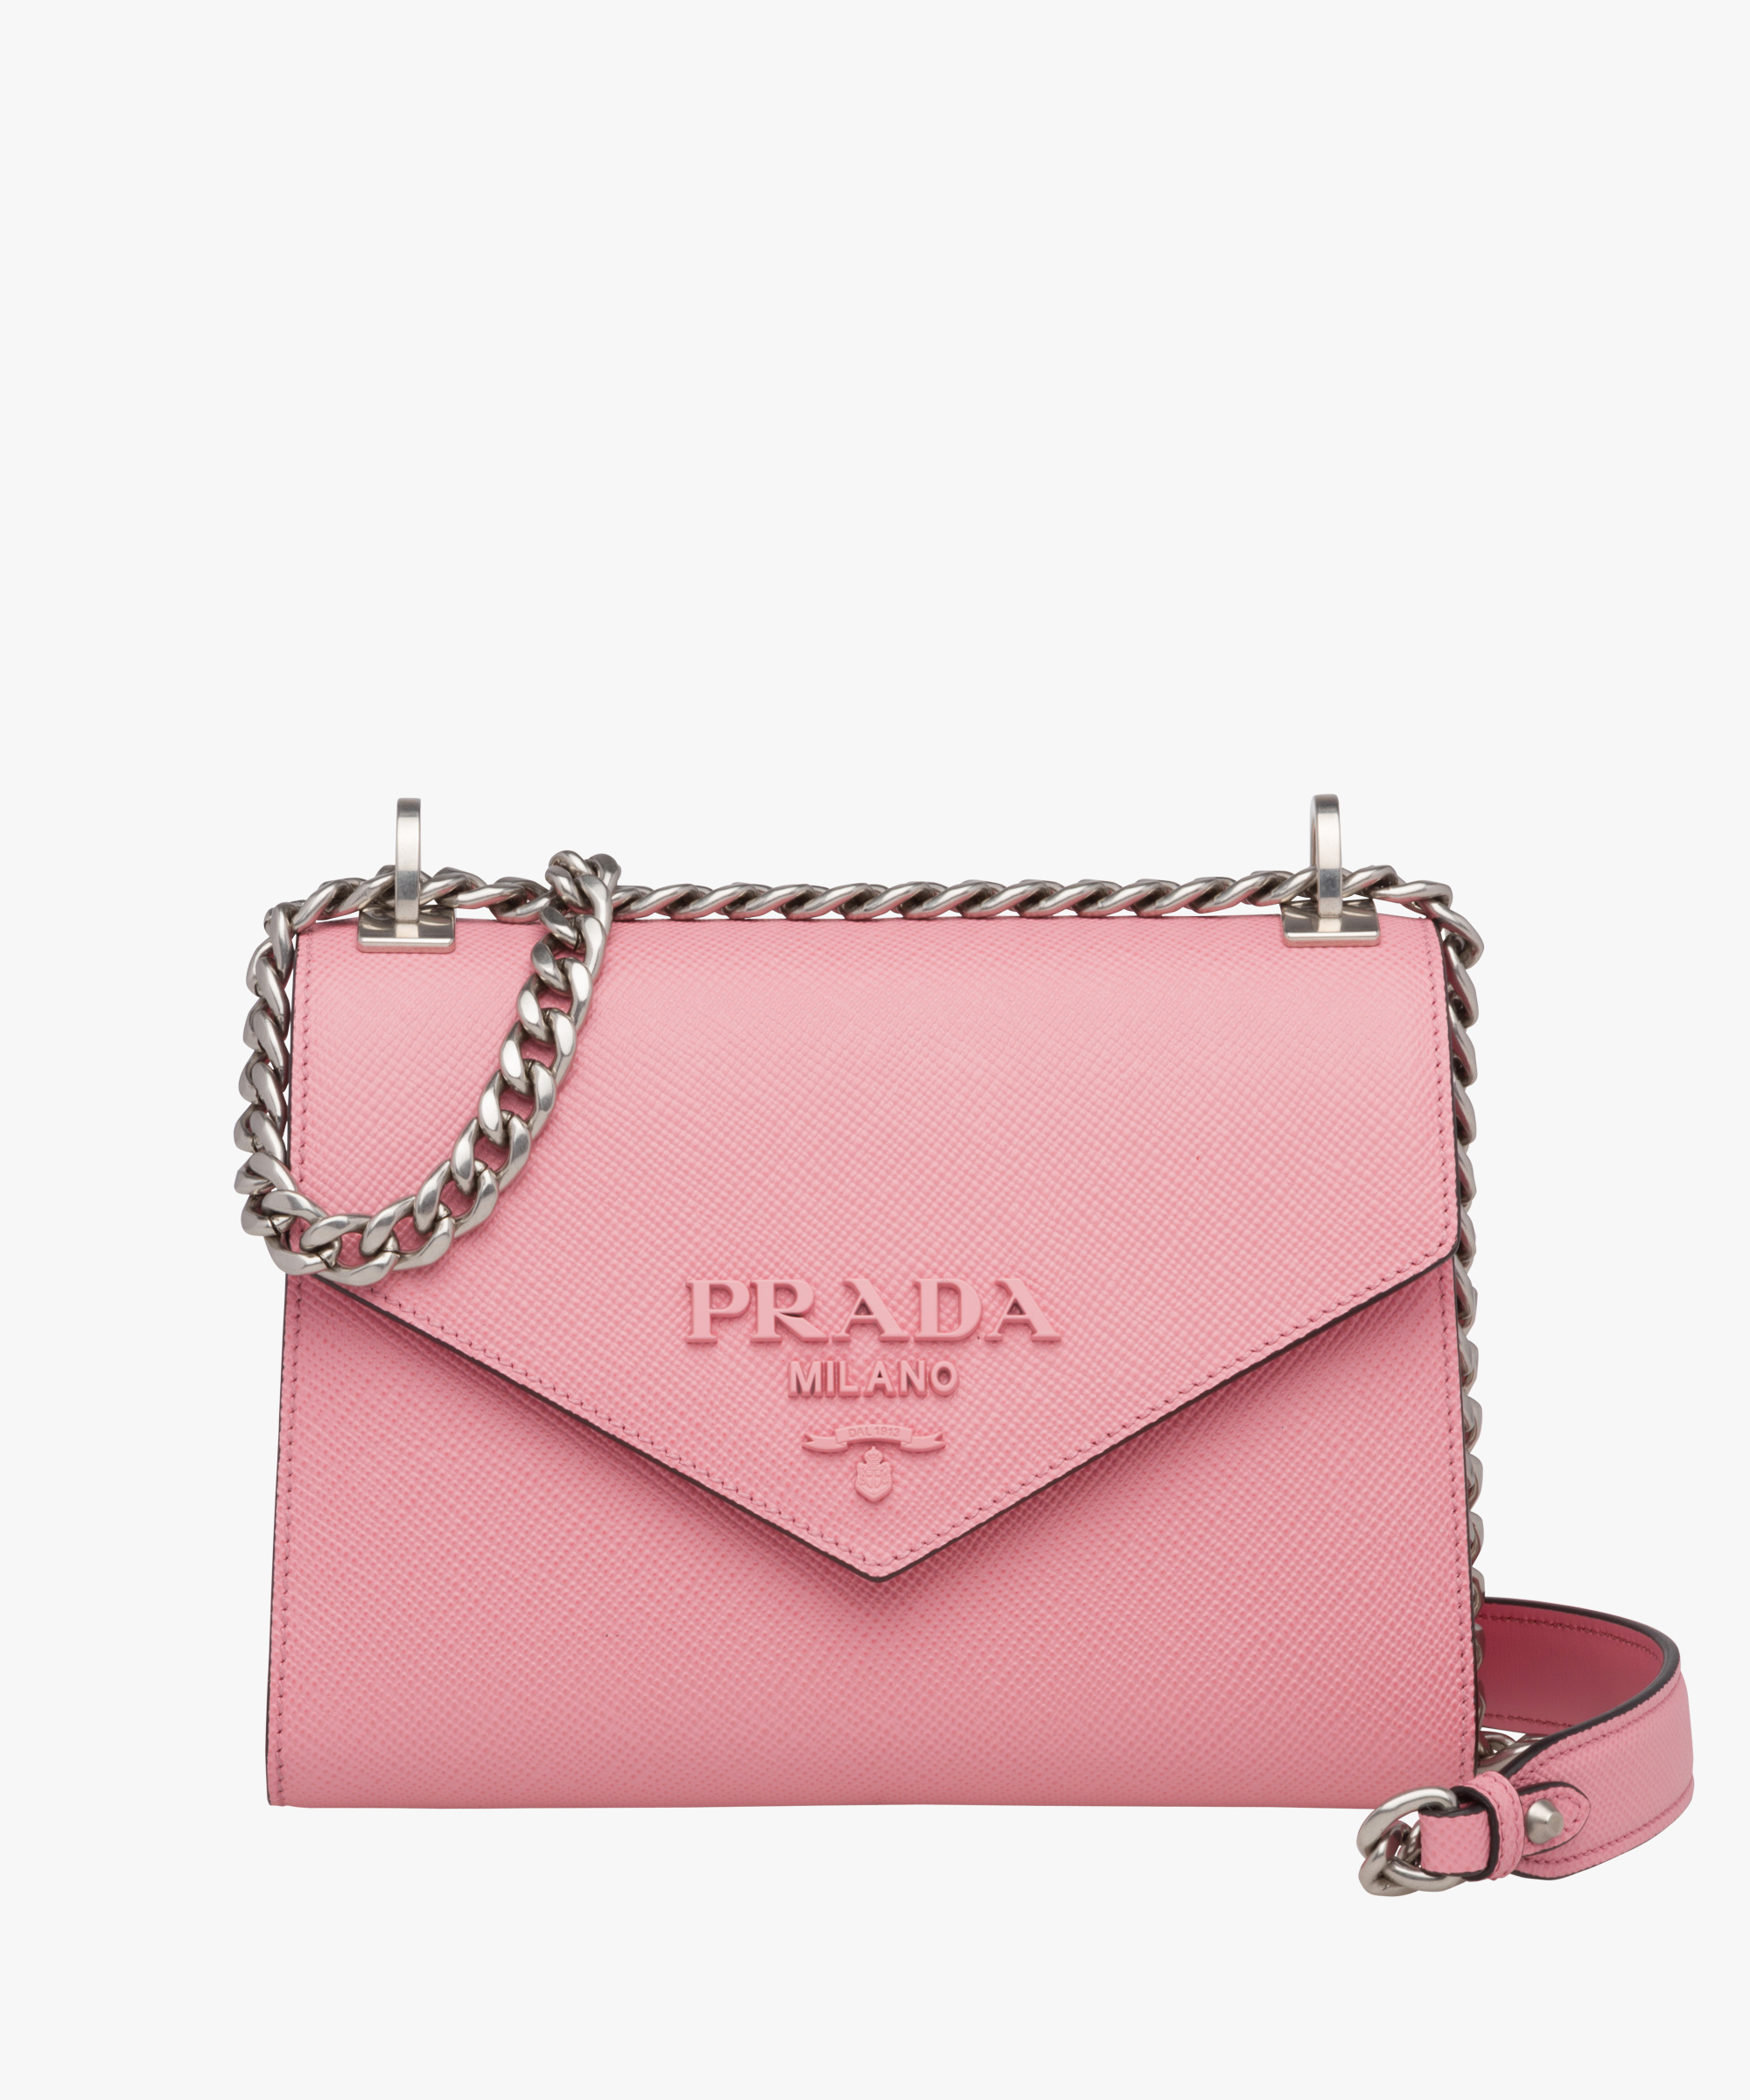 1e6e48e85fb3 ireland prada pink chain bag fe4b4 2b230